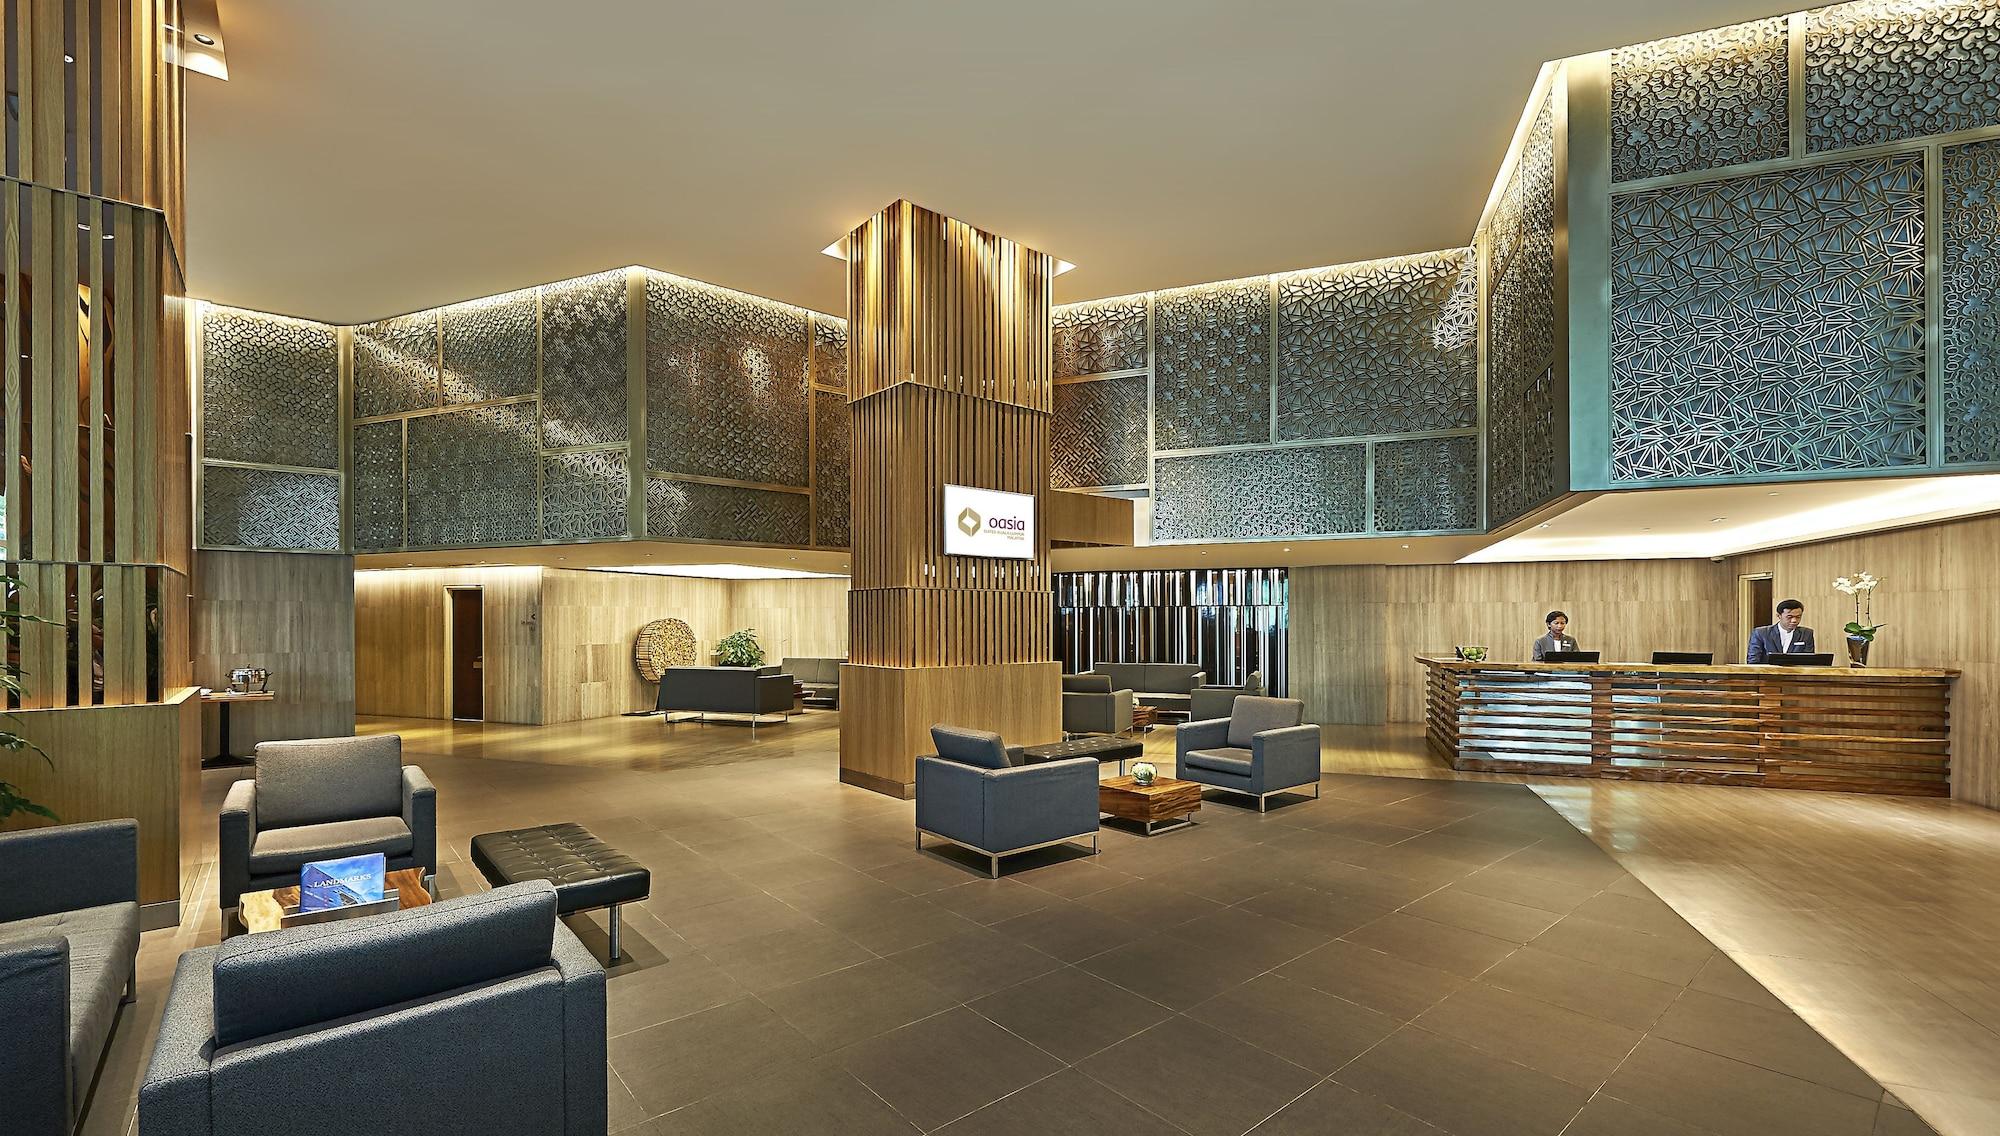 Oasia Suites Kuala Lumpur, Kuala Lumpur